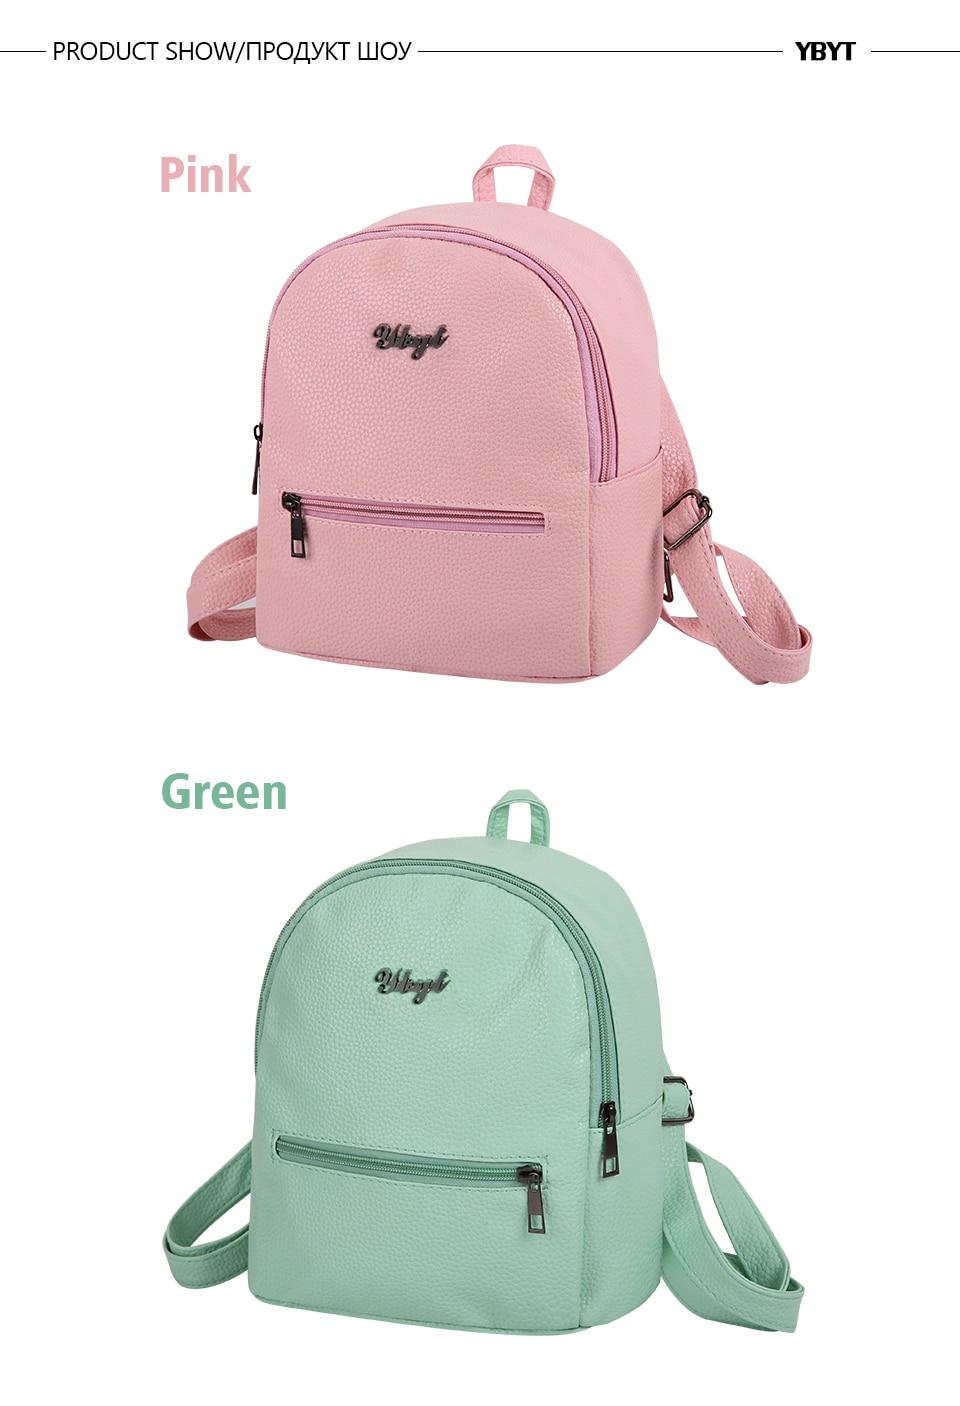 HTB1DQbaXzgy uJjSZR0q6yK5pXaz YBYT brand 2018 new preppy style solid women kawaii rucksack simple lychee pattern ladies travel bag student school backpacks